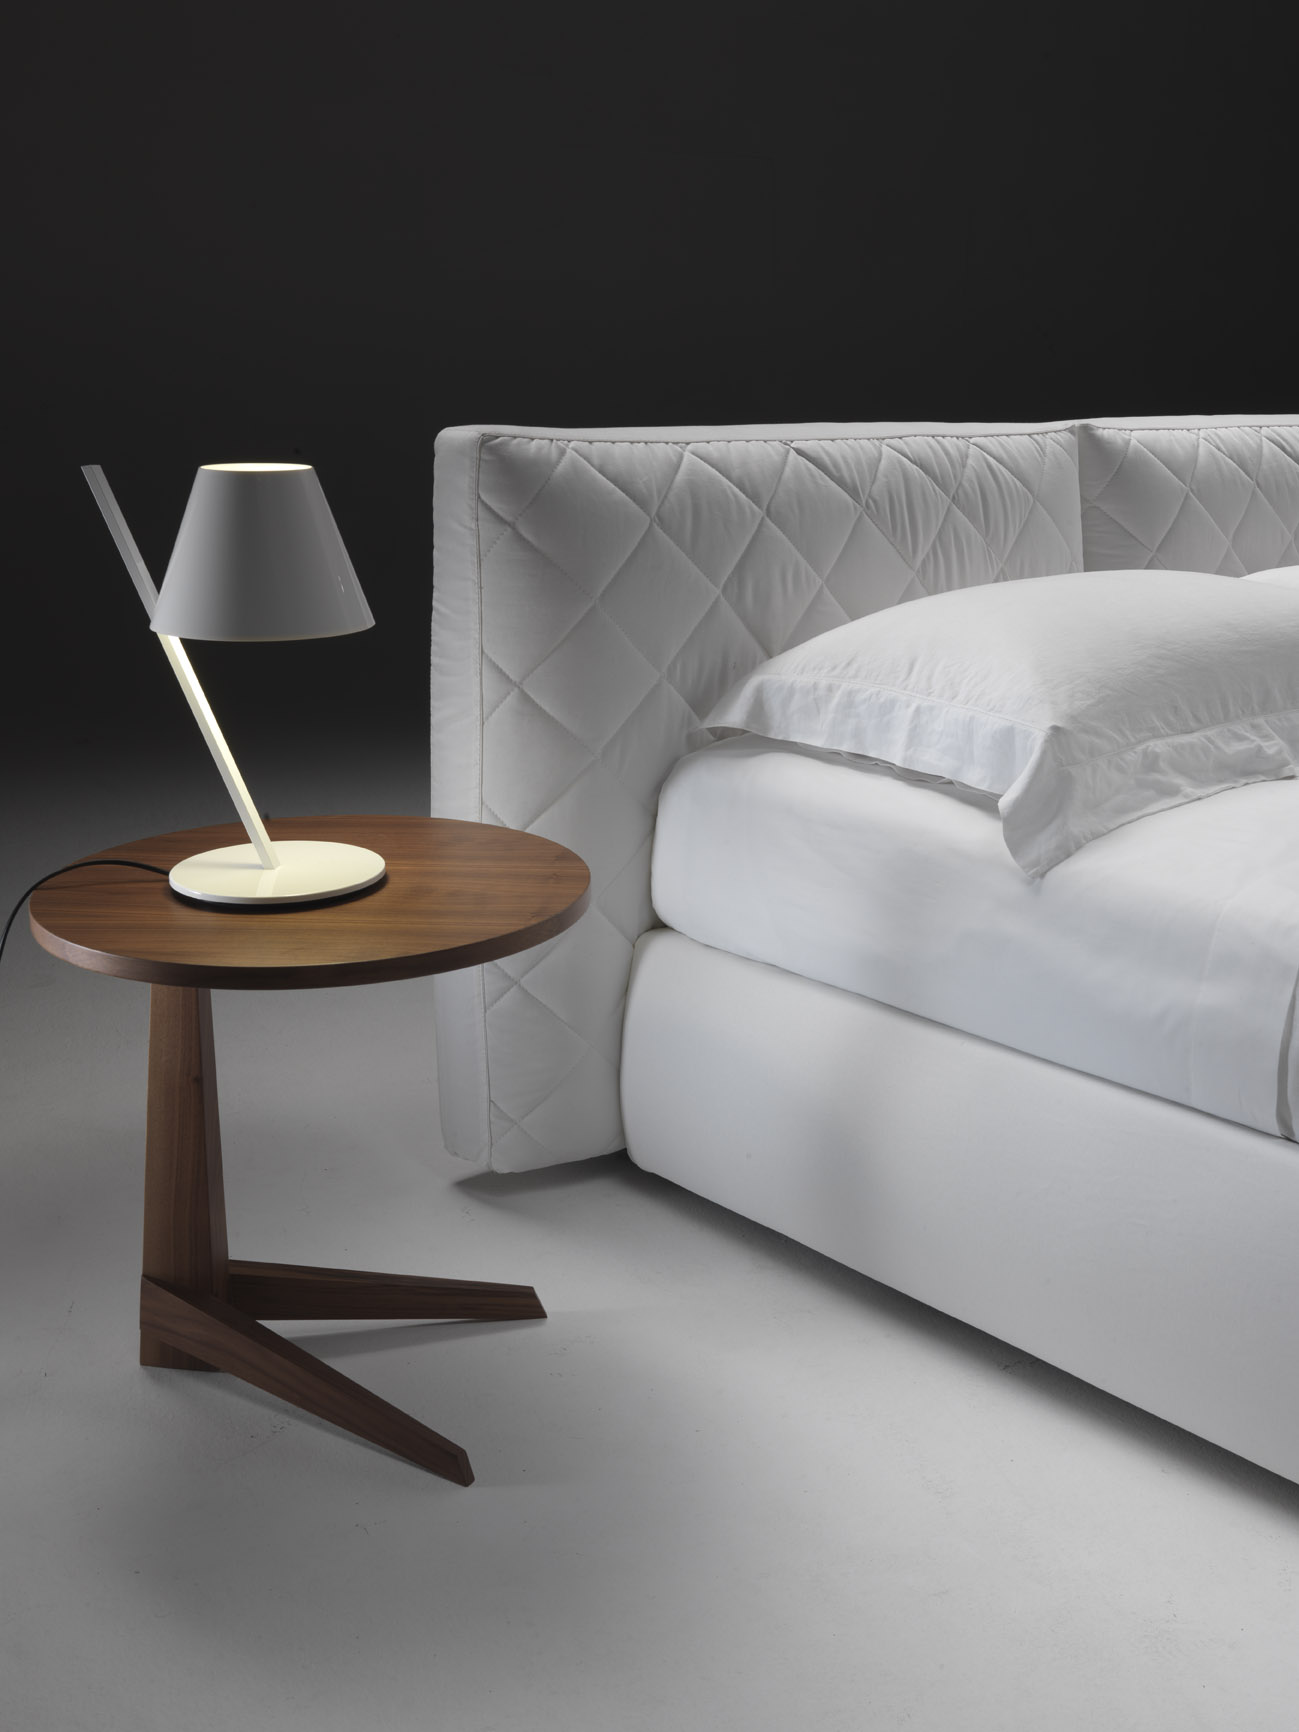 Melbourne Bed - Kappa salotti